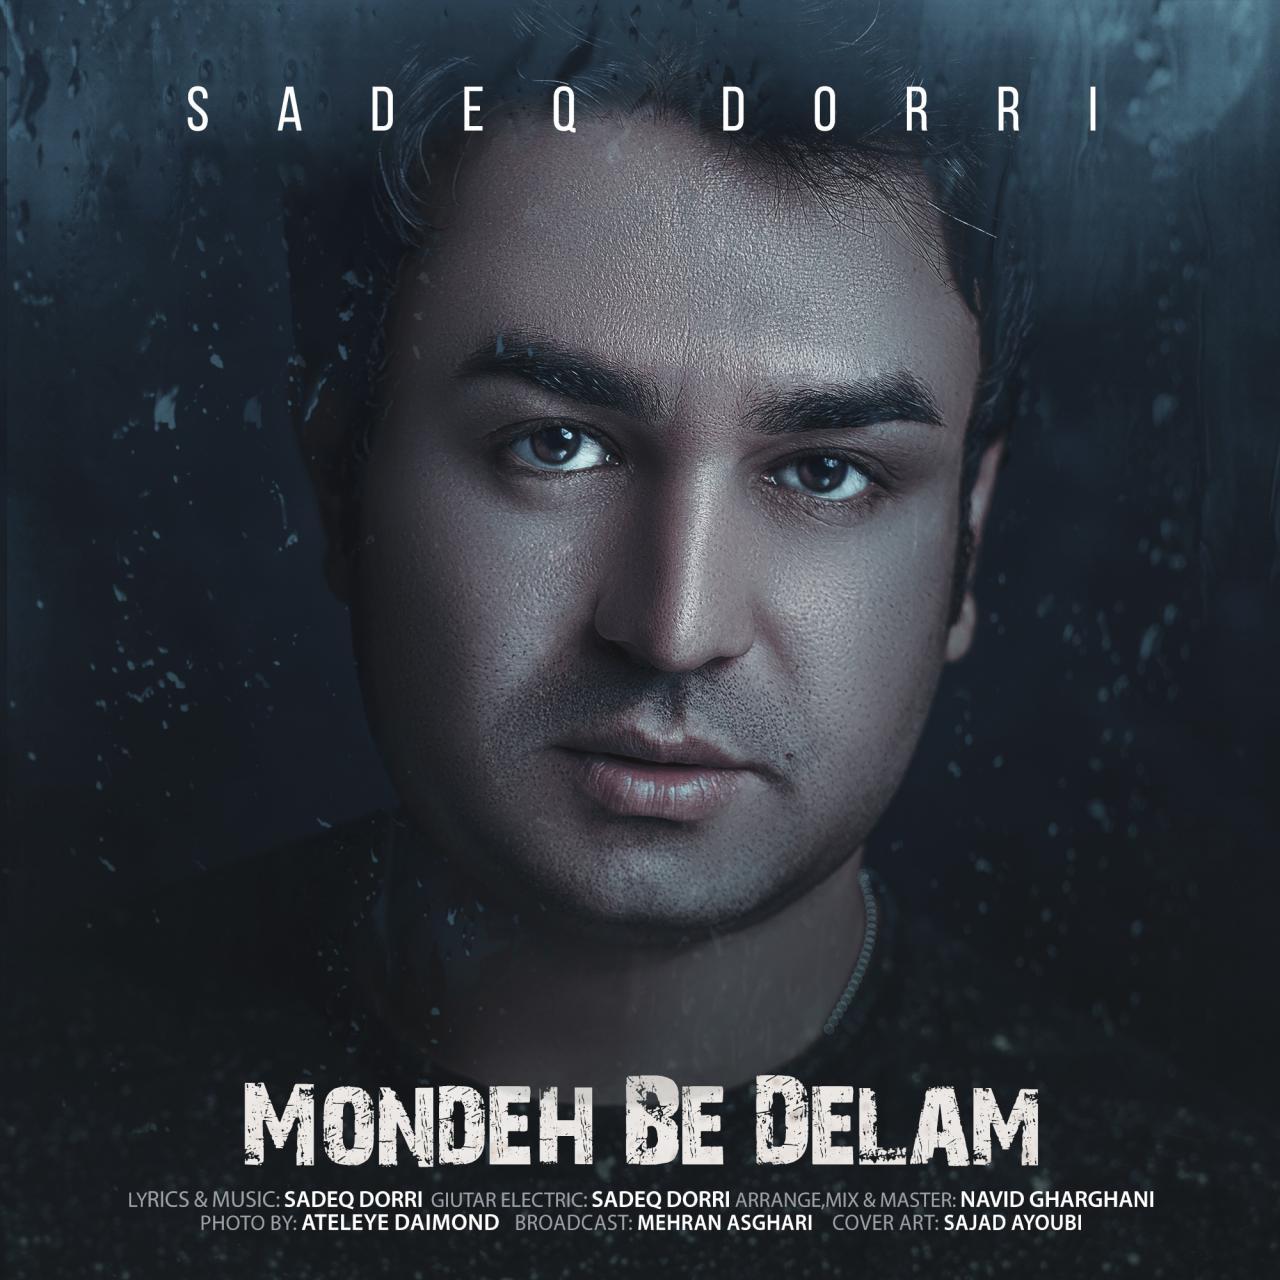 Sadeq Dorri – Mondeh Be Delam